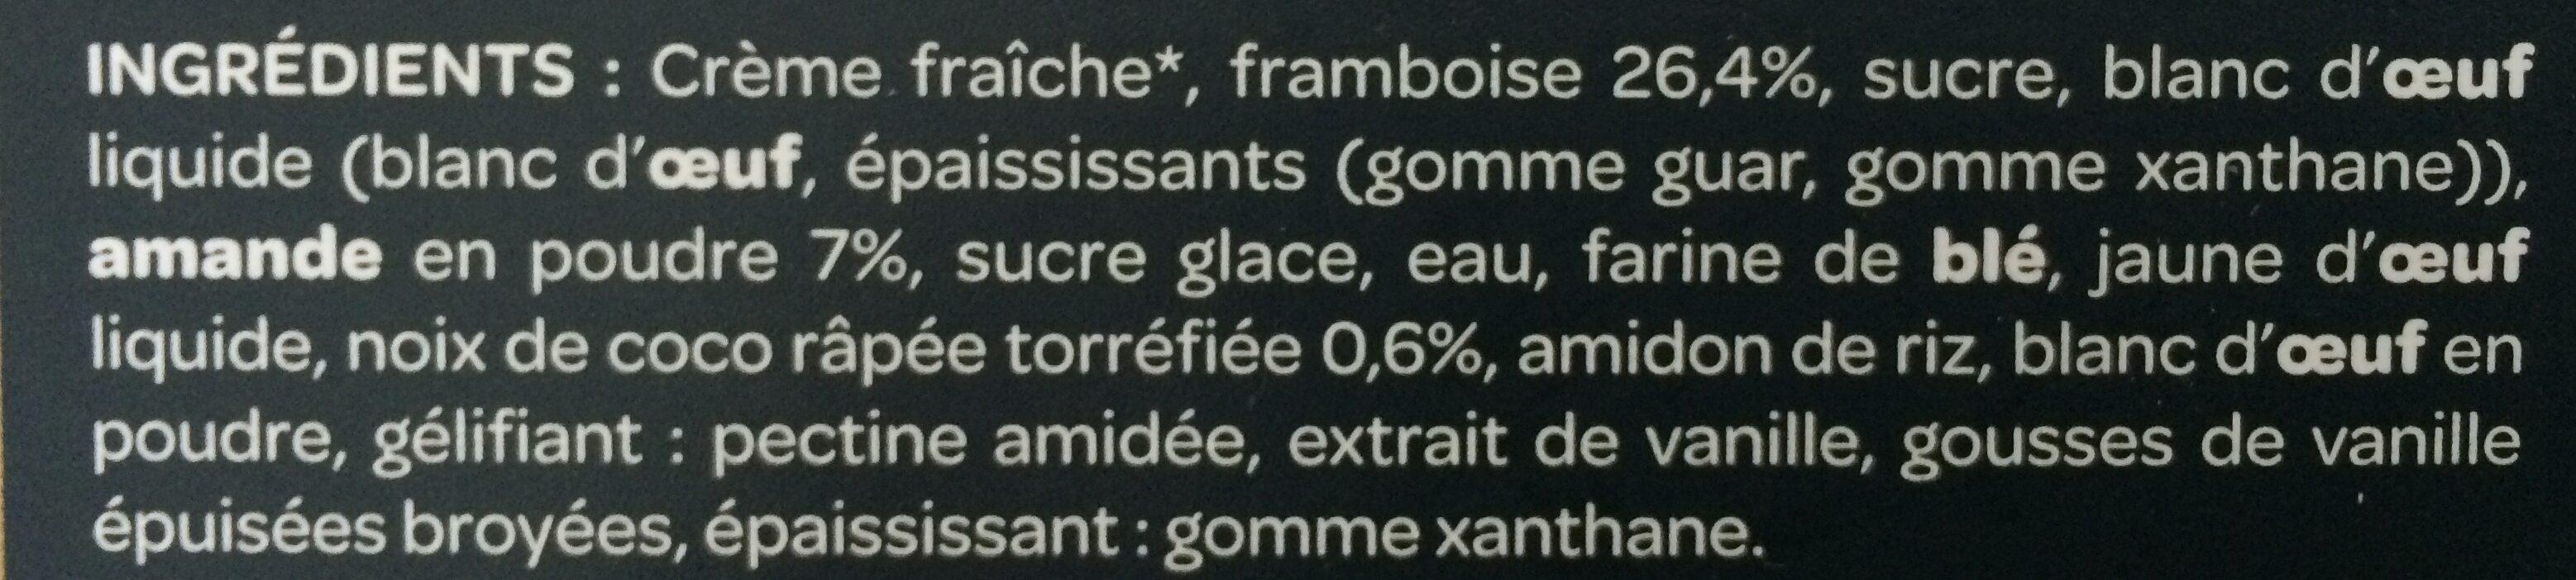 Adelie Macaron Framboises - Ingredients